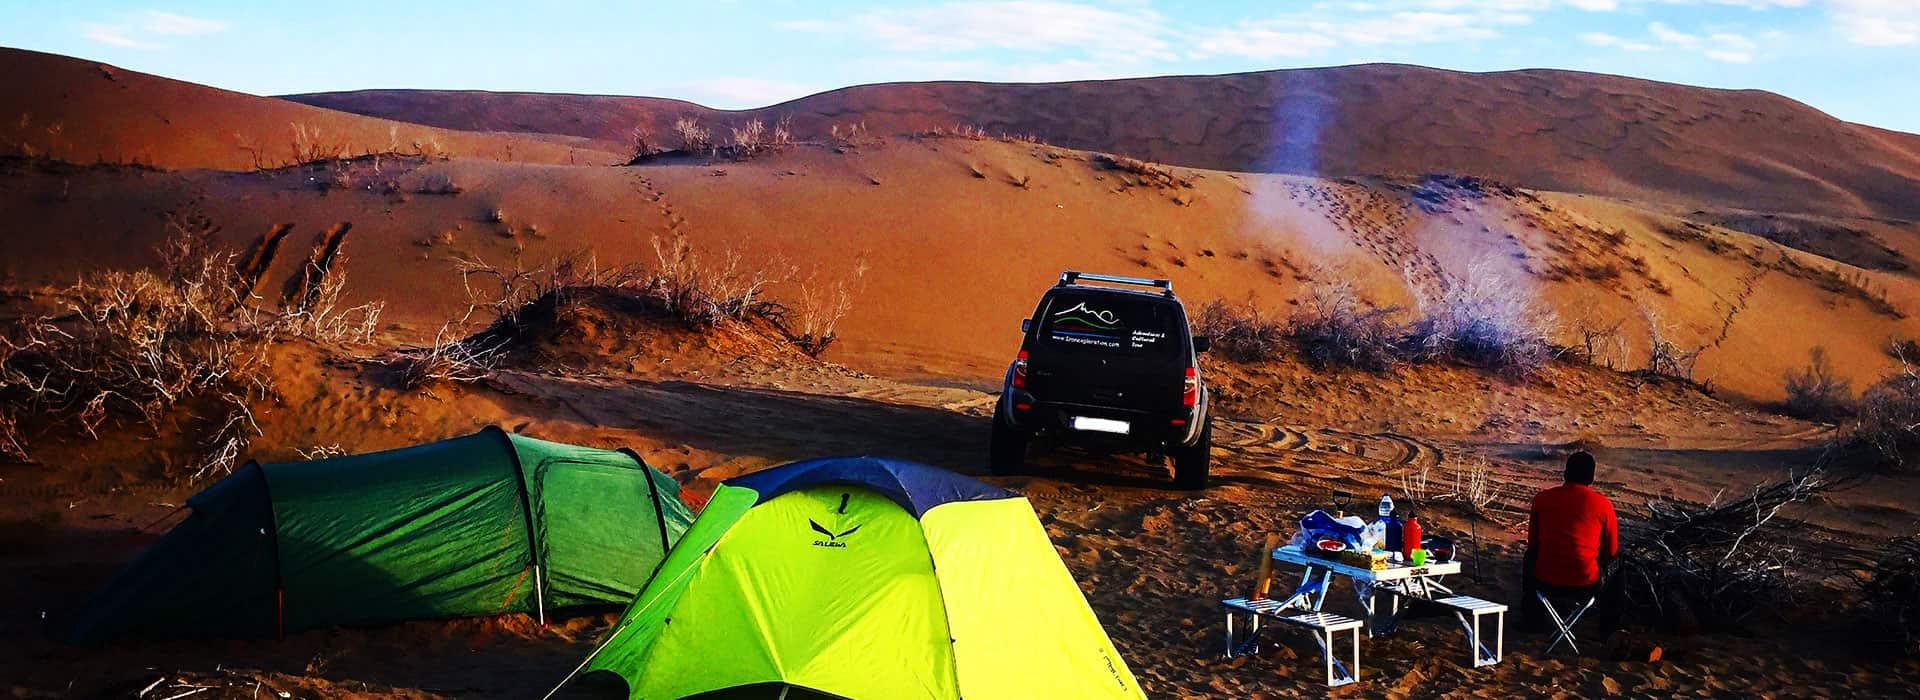 Safari Camp in Iran's Desert